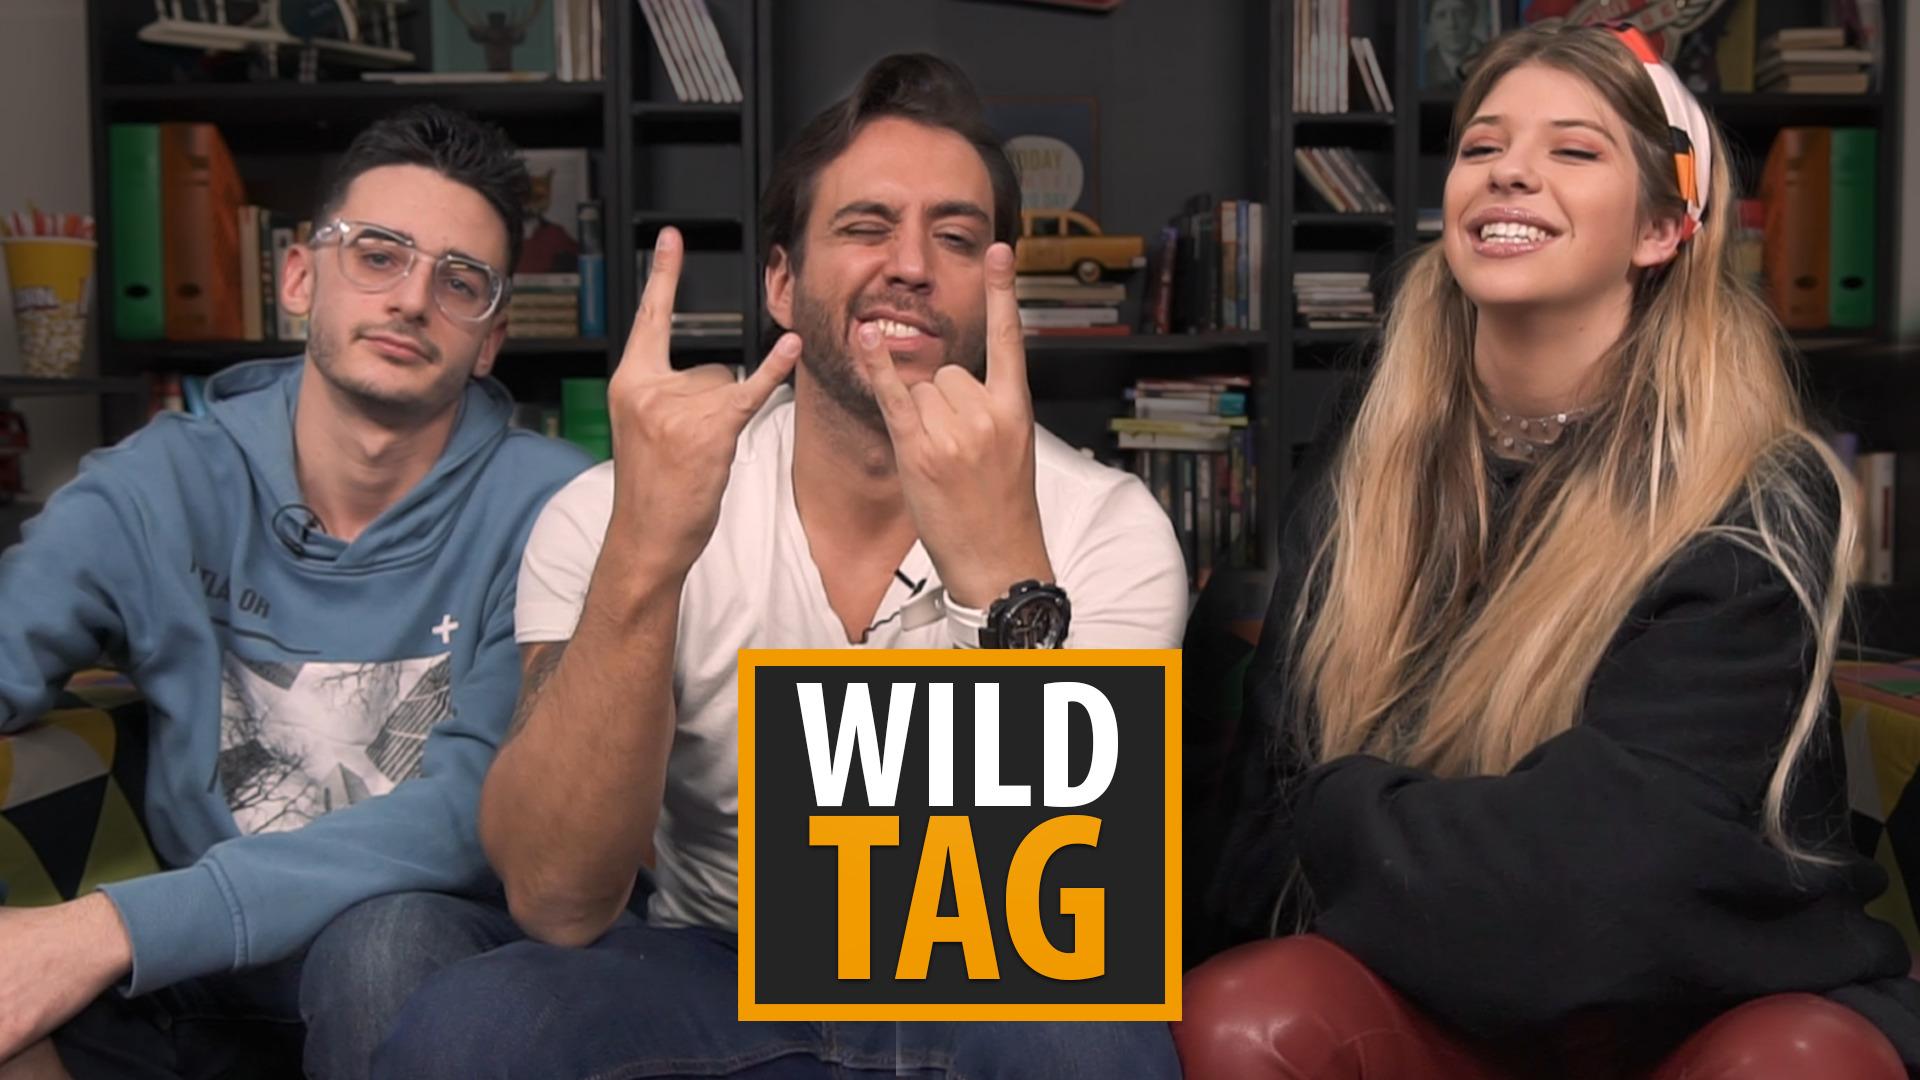 Temporada 2 WILD TAG con Jordi Wild